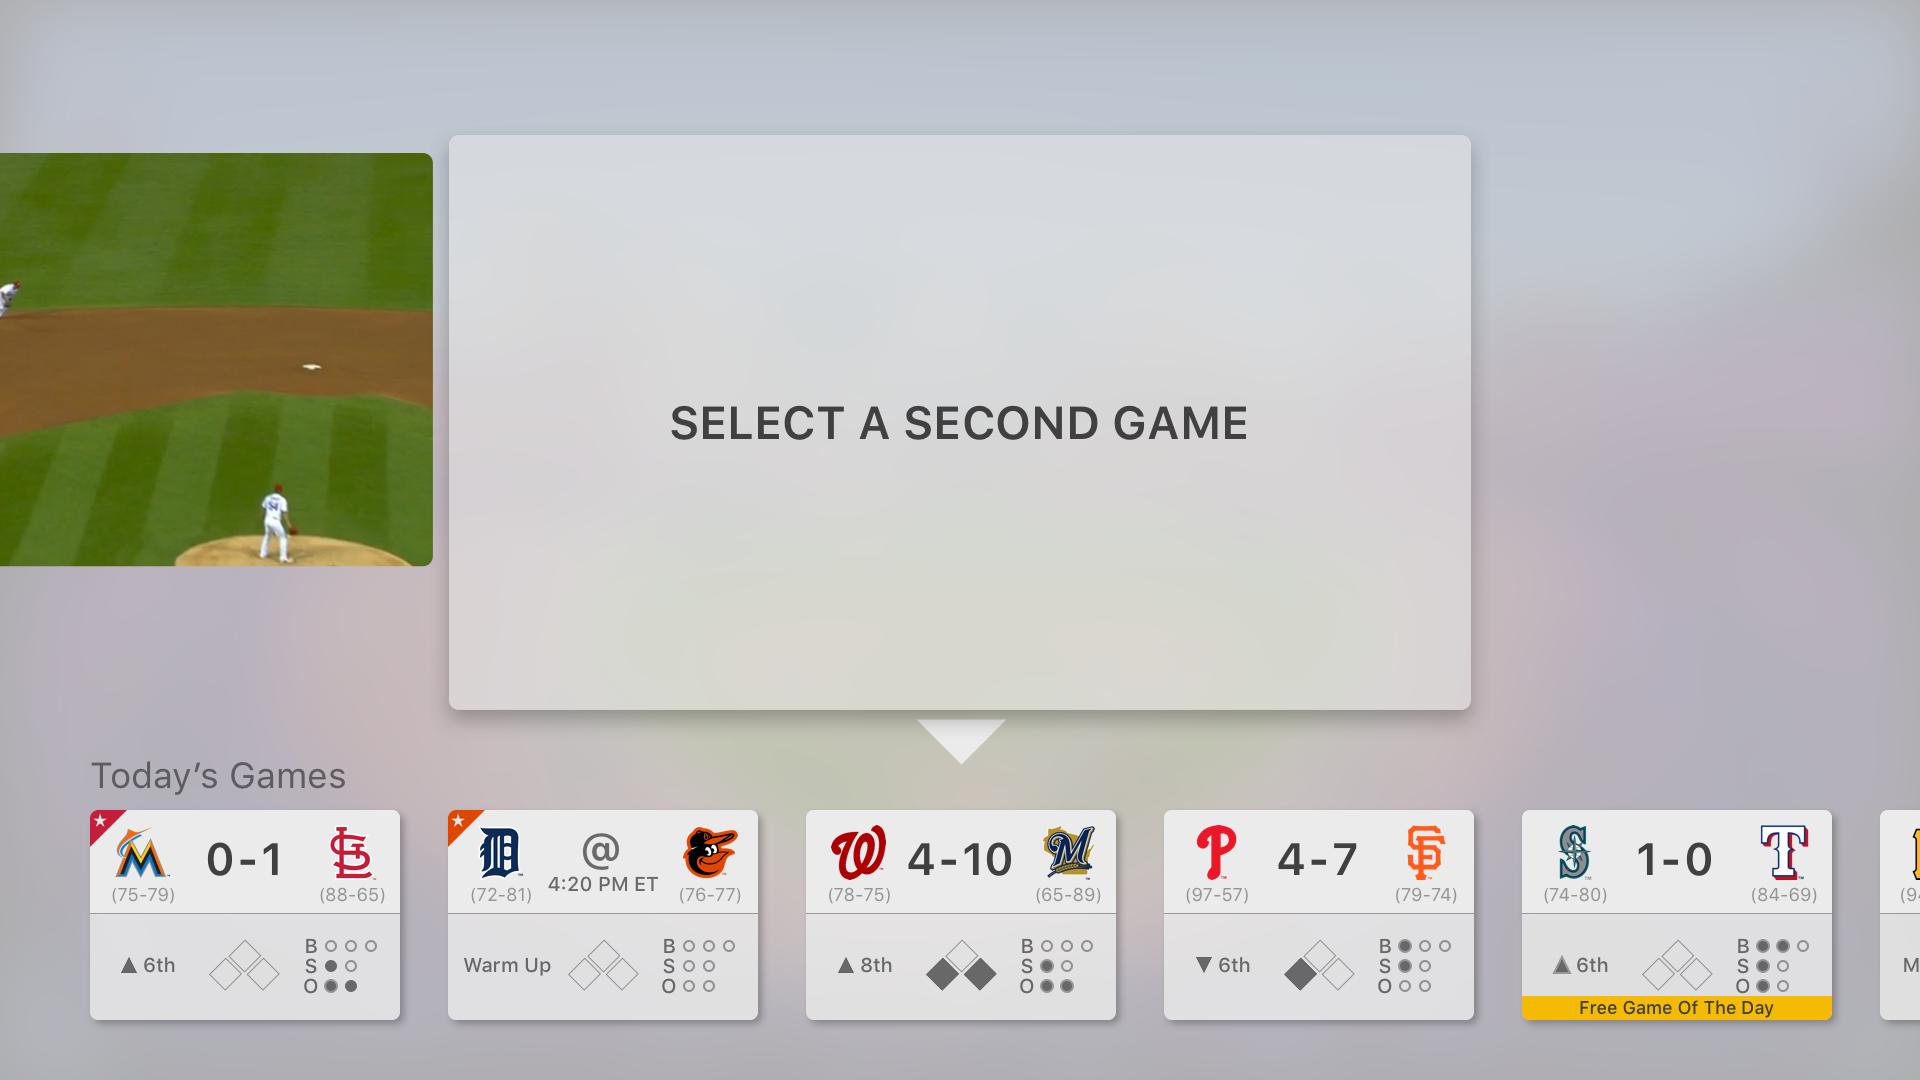 Mlb Tv Games Today Major League Baseball Major League